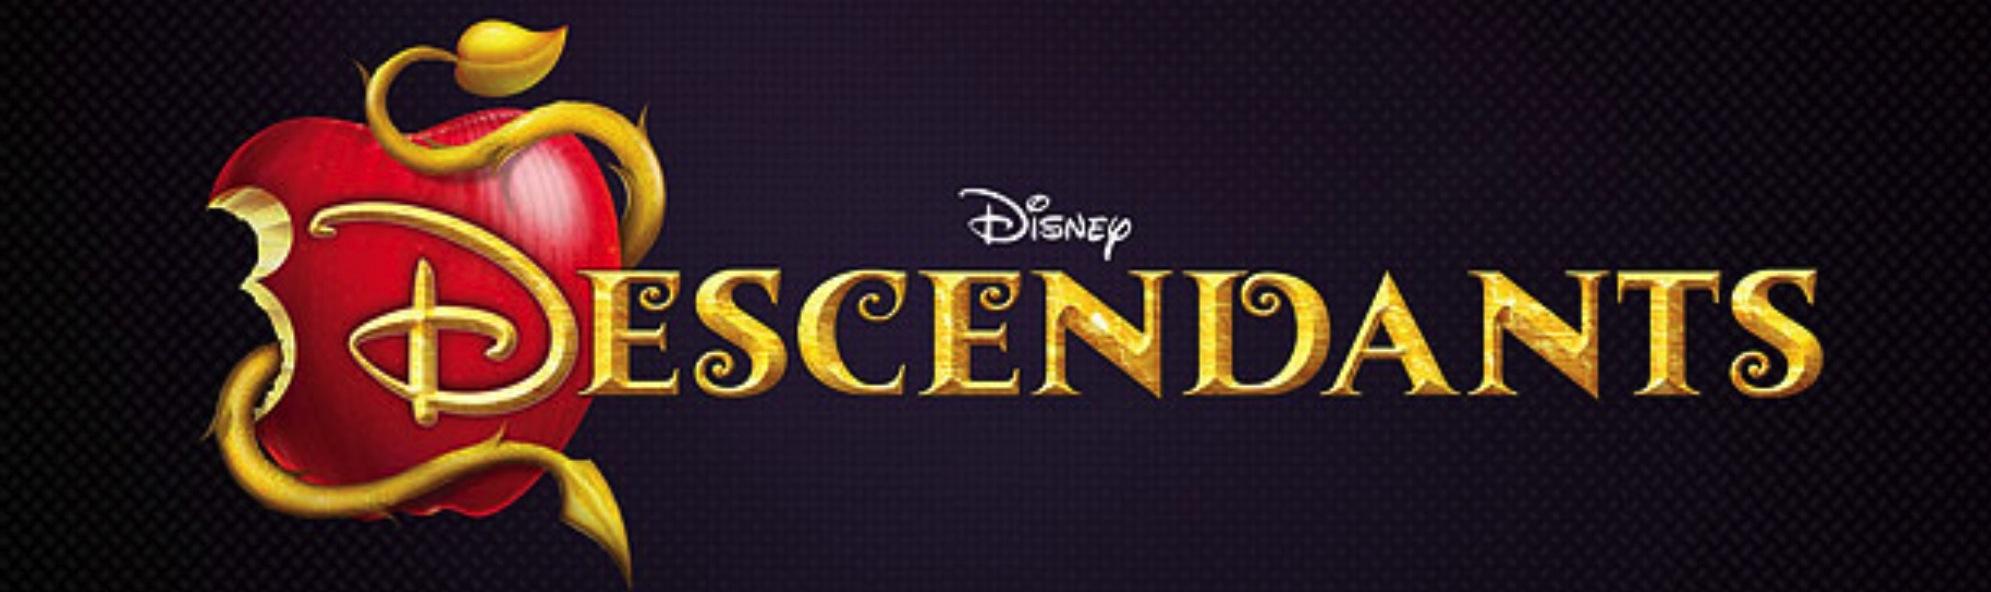 Descendants. Disney. Banner. 2015.